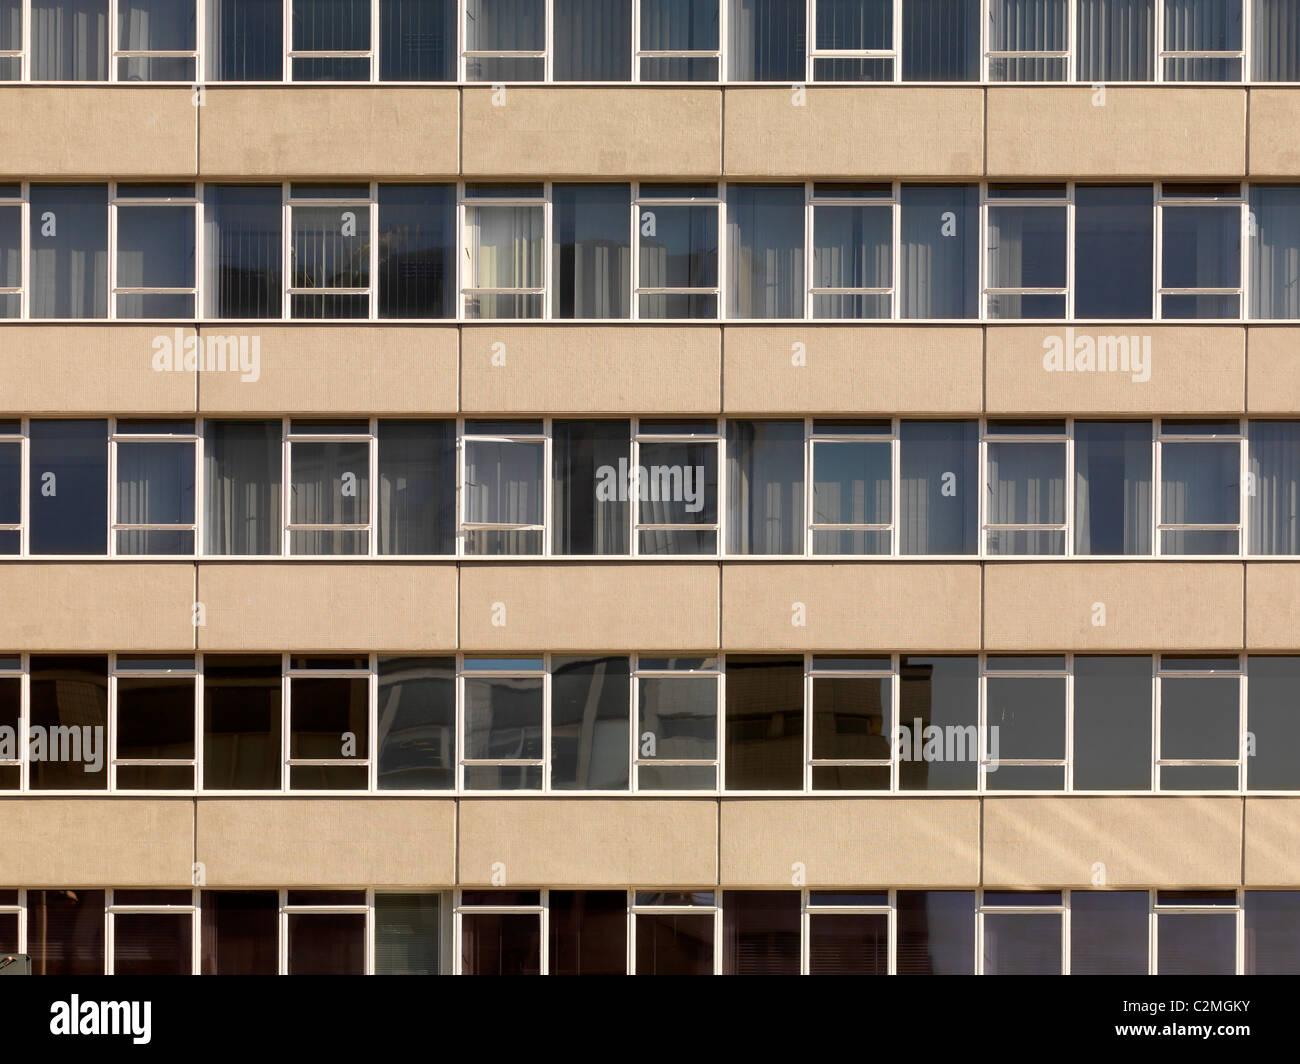 General views of City Centre, Croydon - Stock Image